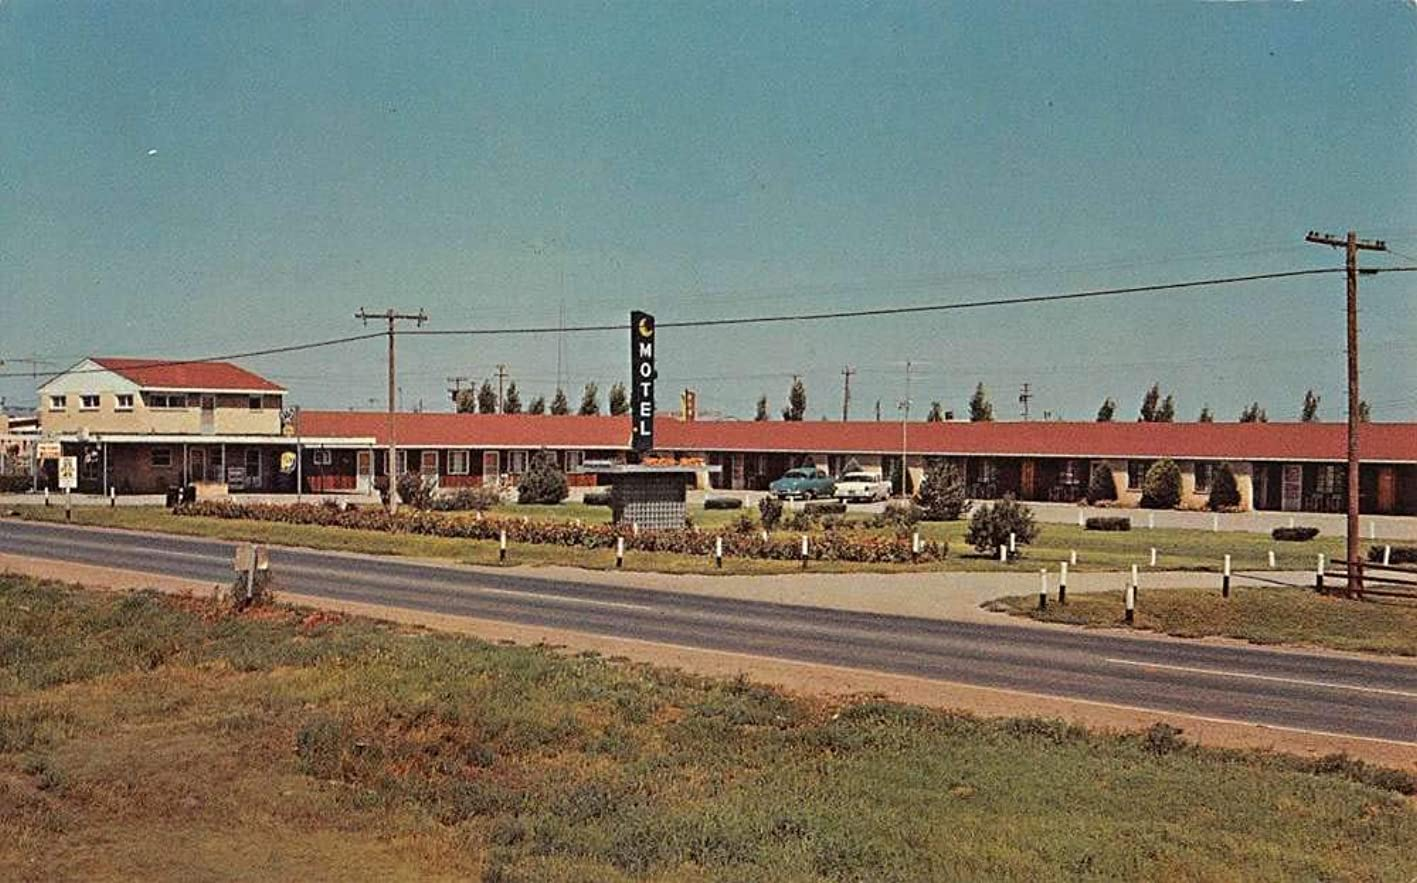 Meade Kansas Moon Mist Motel Street View Vintage Postcard K431469 vlfjeonqryt064